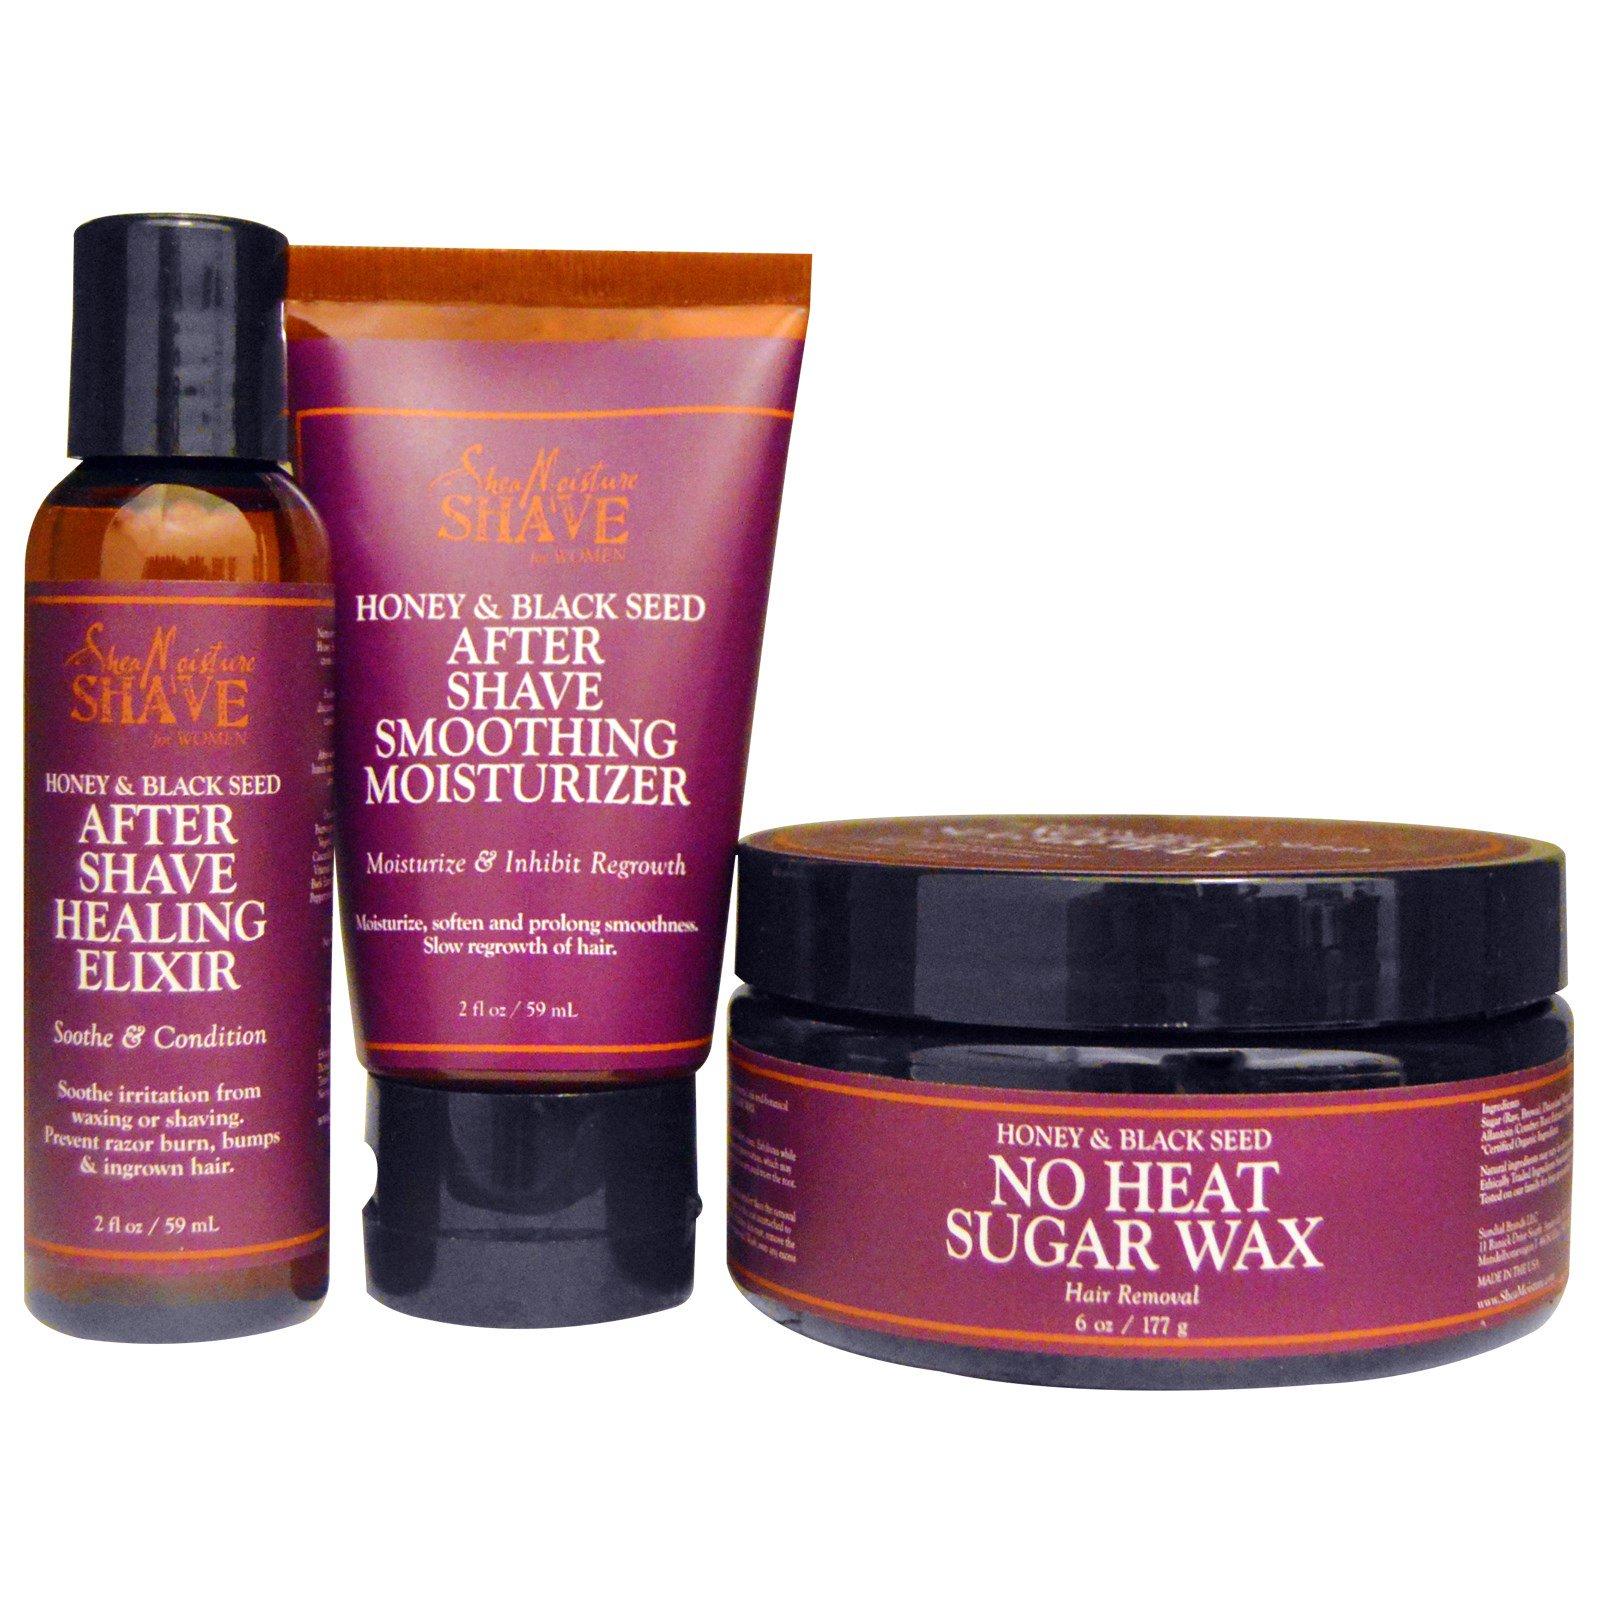 SheaMoisture, Shave, No-Heat Sugar Wax Spa Kit, For Women, Honey & Black  Seed, 1 Kit (Discontinued Item)